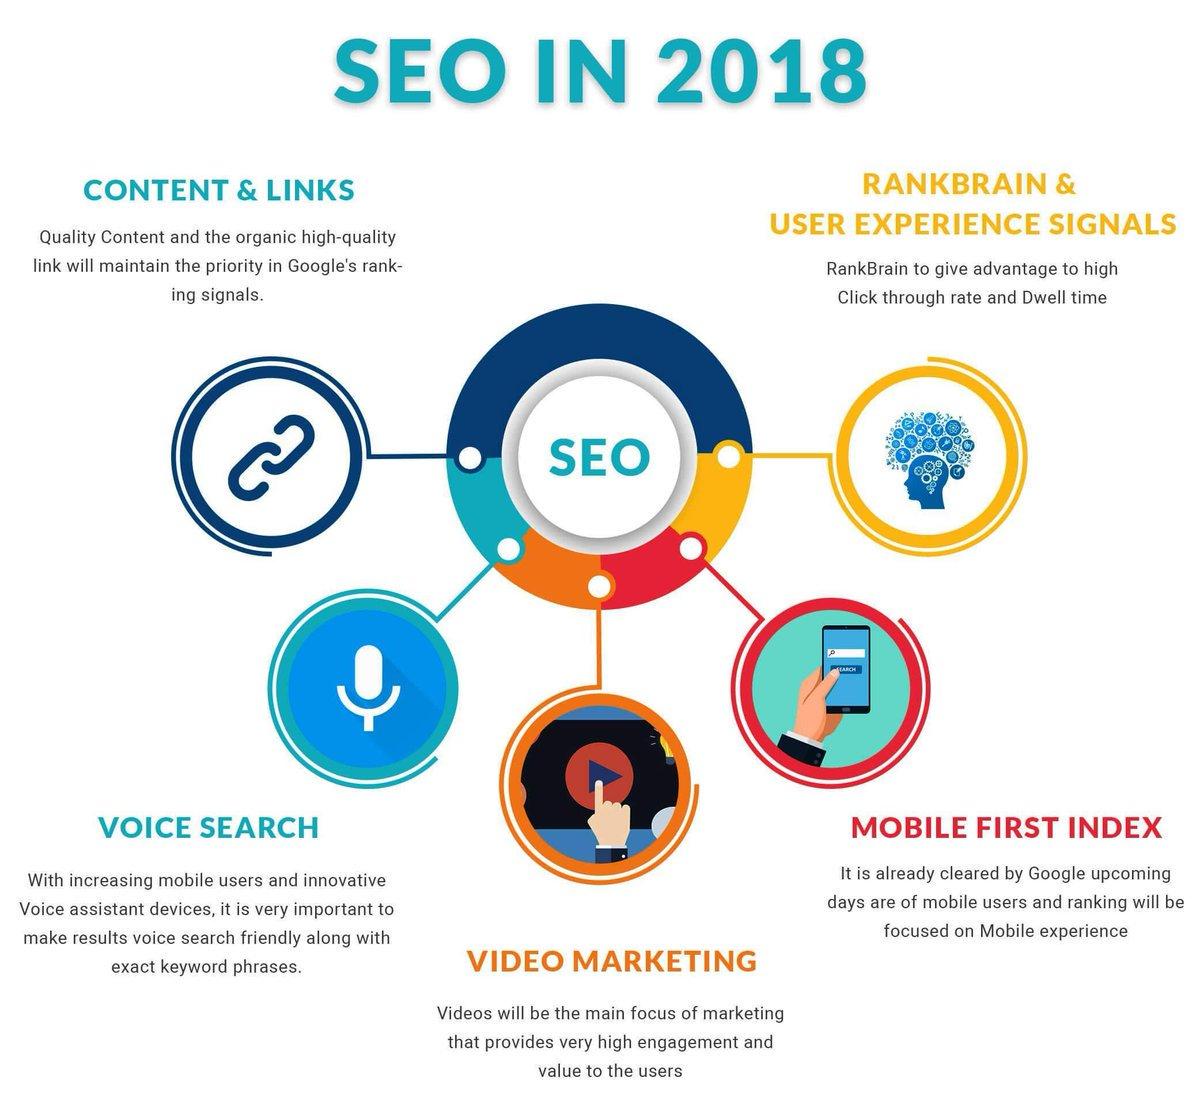 Latest trends of #SEO in 2018  #DigitalMarketing #SEOTalk #SEOServices #SeoSoftware #LinkBuilding #backlinks #VideoMarketing #mobilemarketing #InternetMarketing #OnlineMarketing #socialmedia #GrowthHacking #SEOTalk #SearchEngineOptimization #SEM #SMM #SearchEngine… by #RedAlkemi<br>http://pic.twitter.com/PUYGgMvfgr